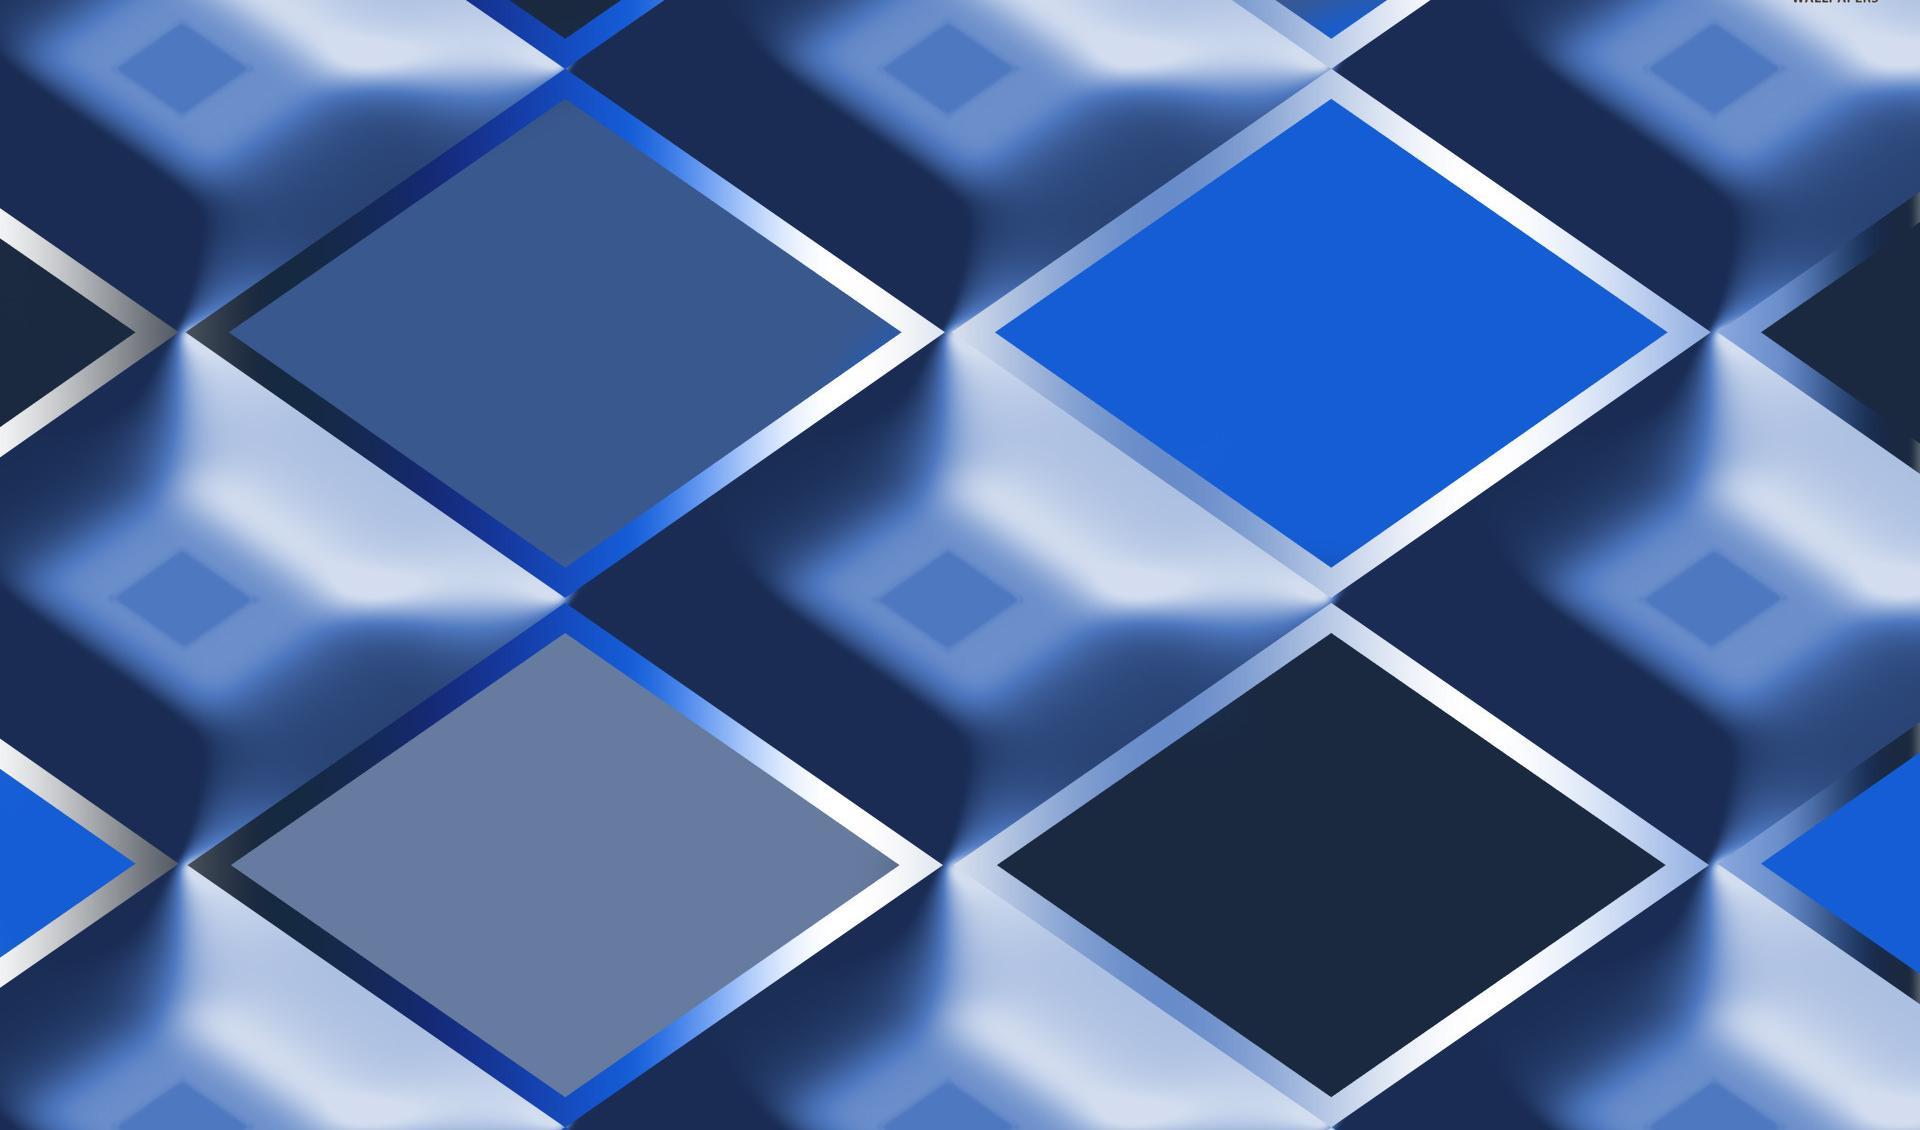 Blue diamonds wallpapers HD quality